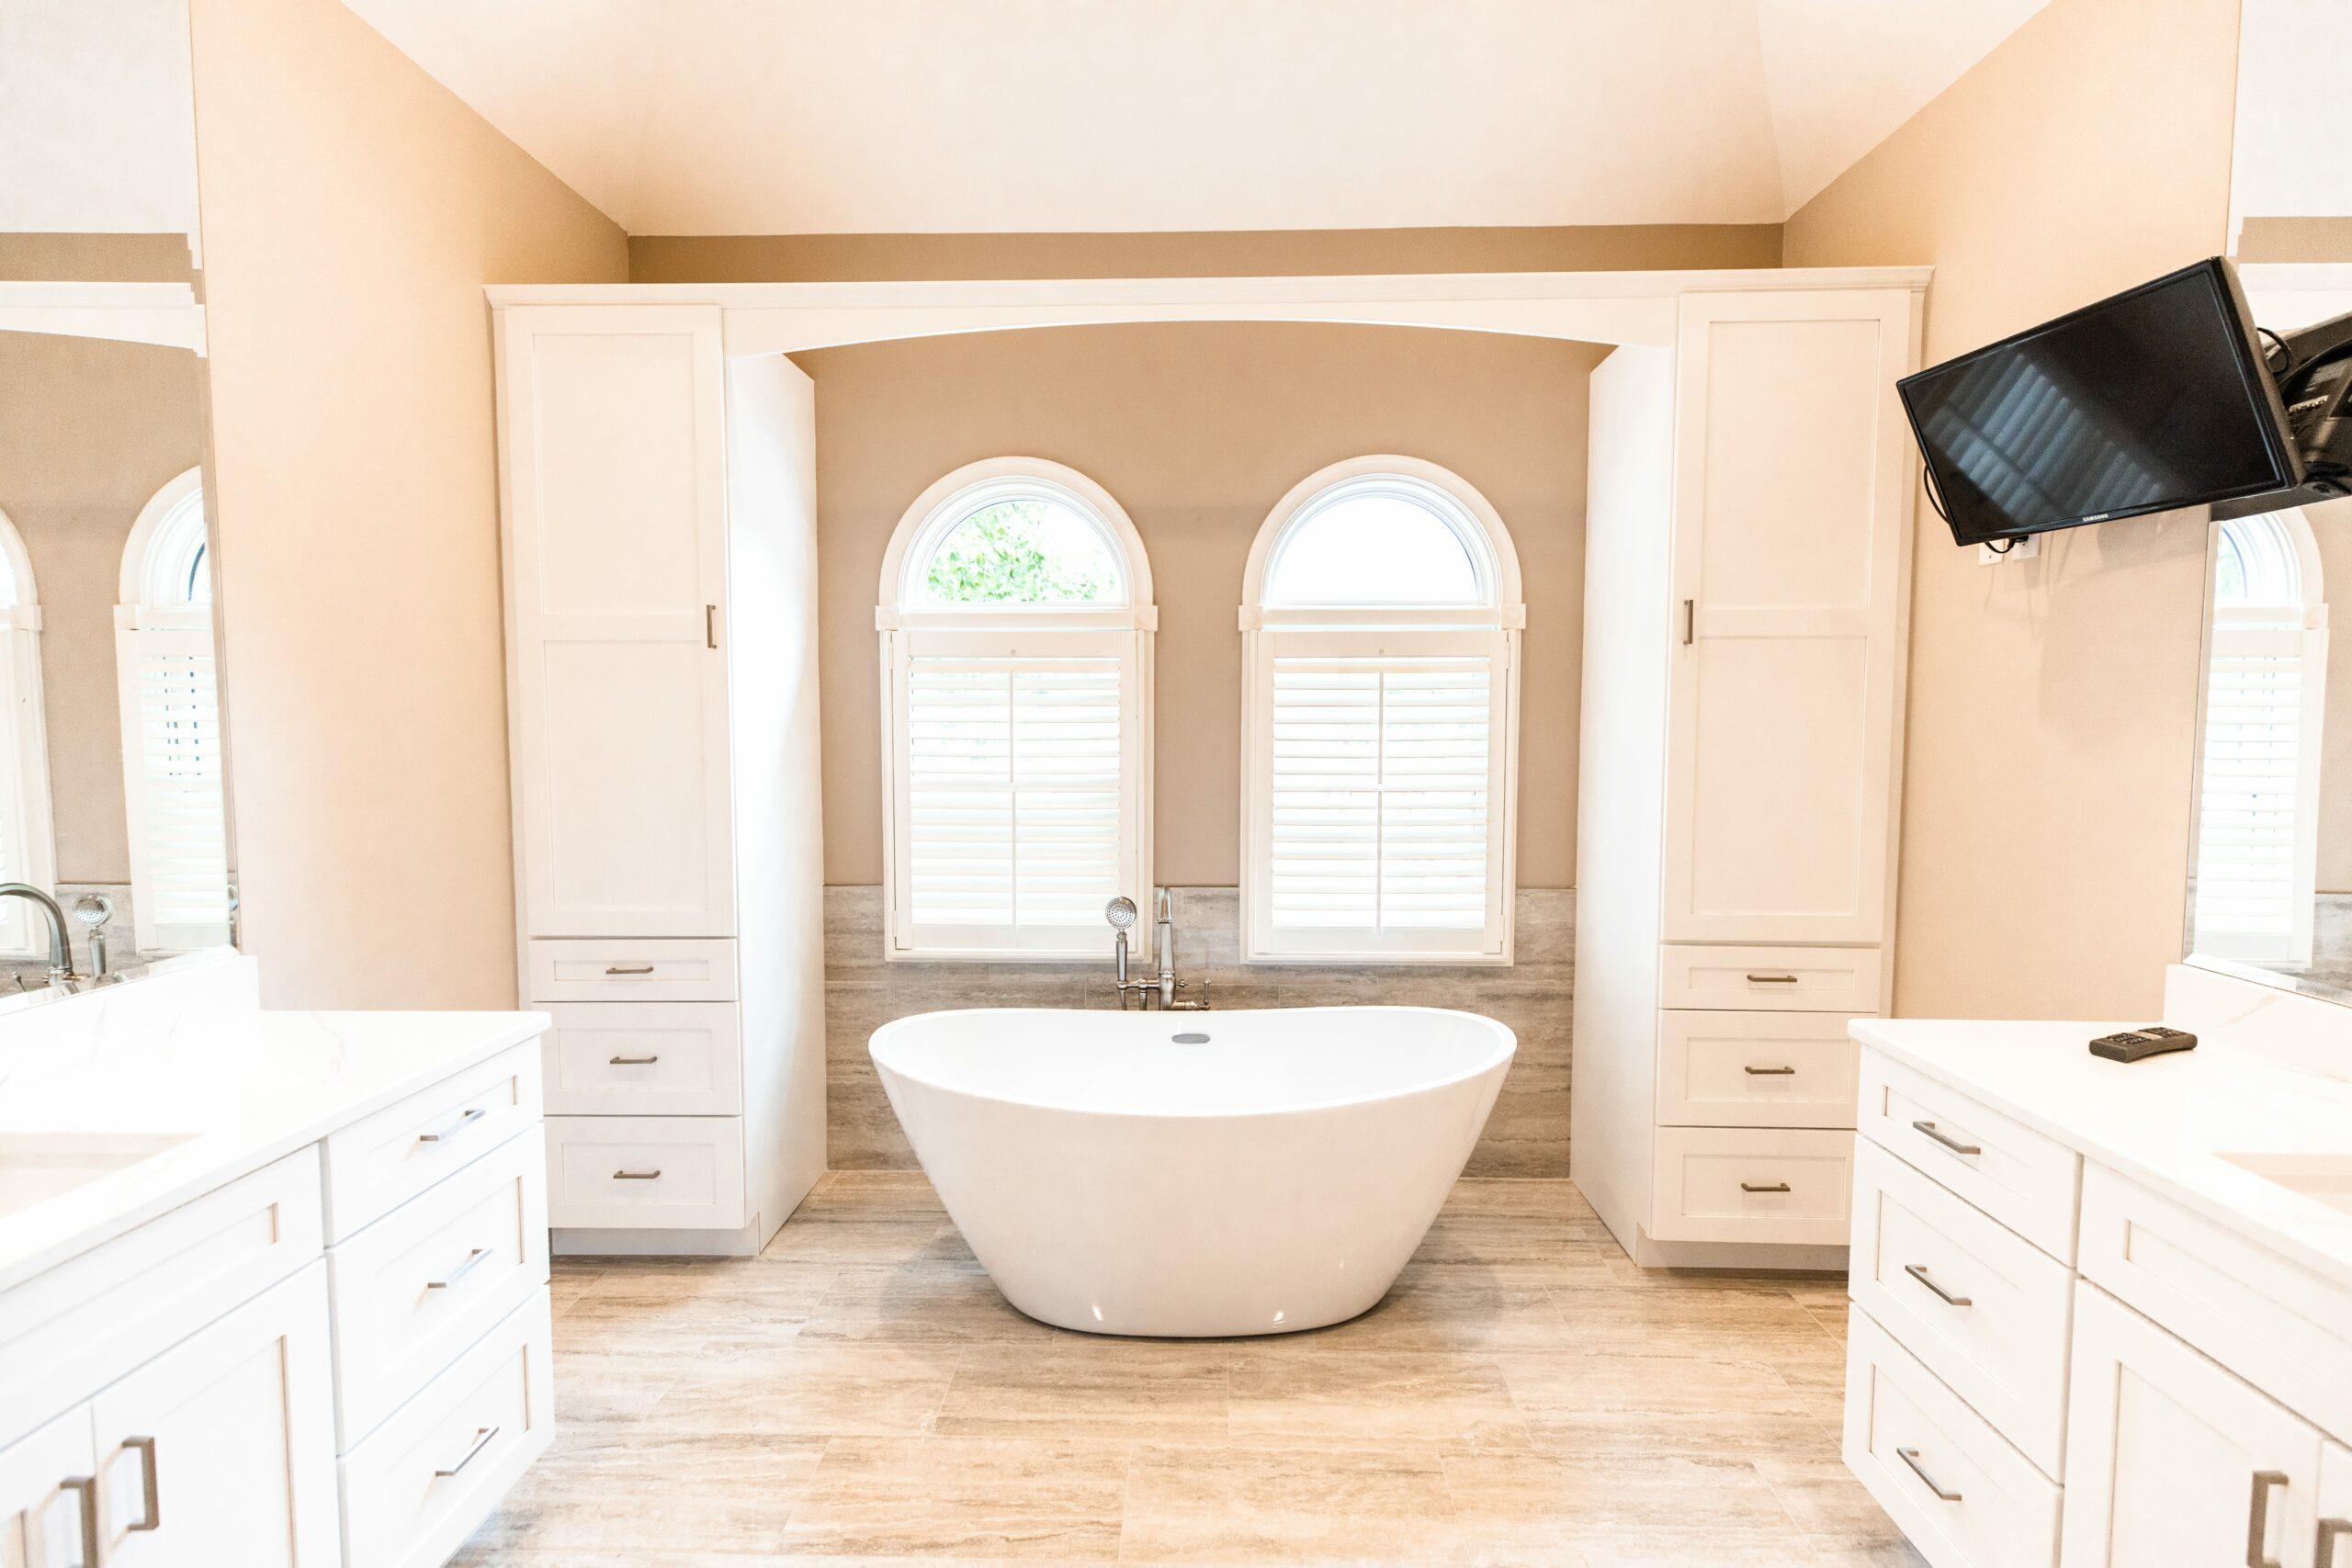 bathroom remodeling company in Ellicott